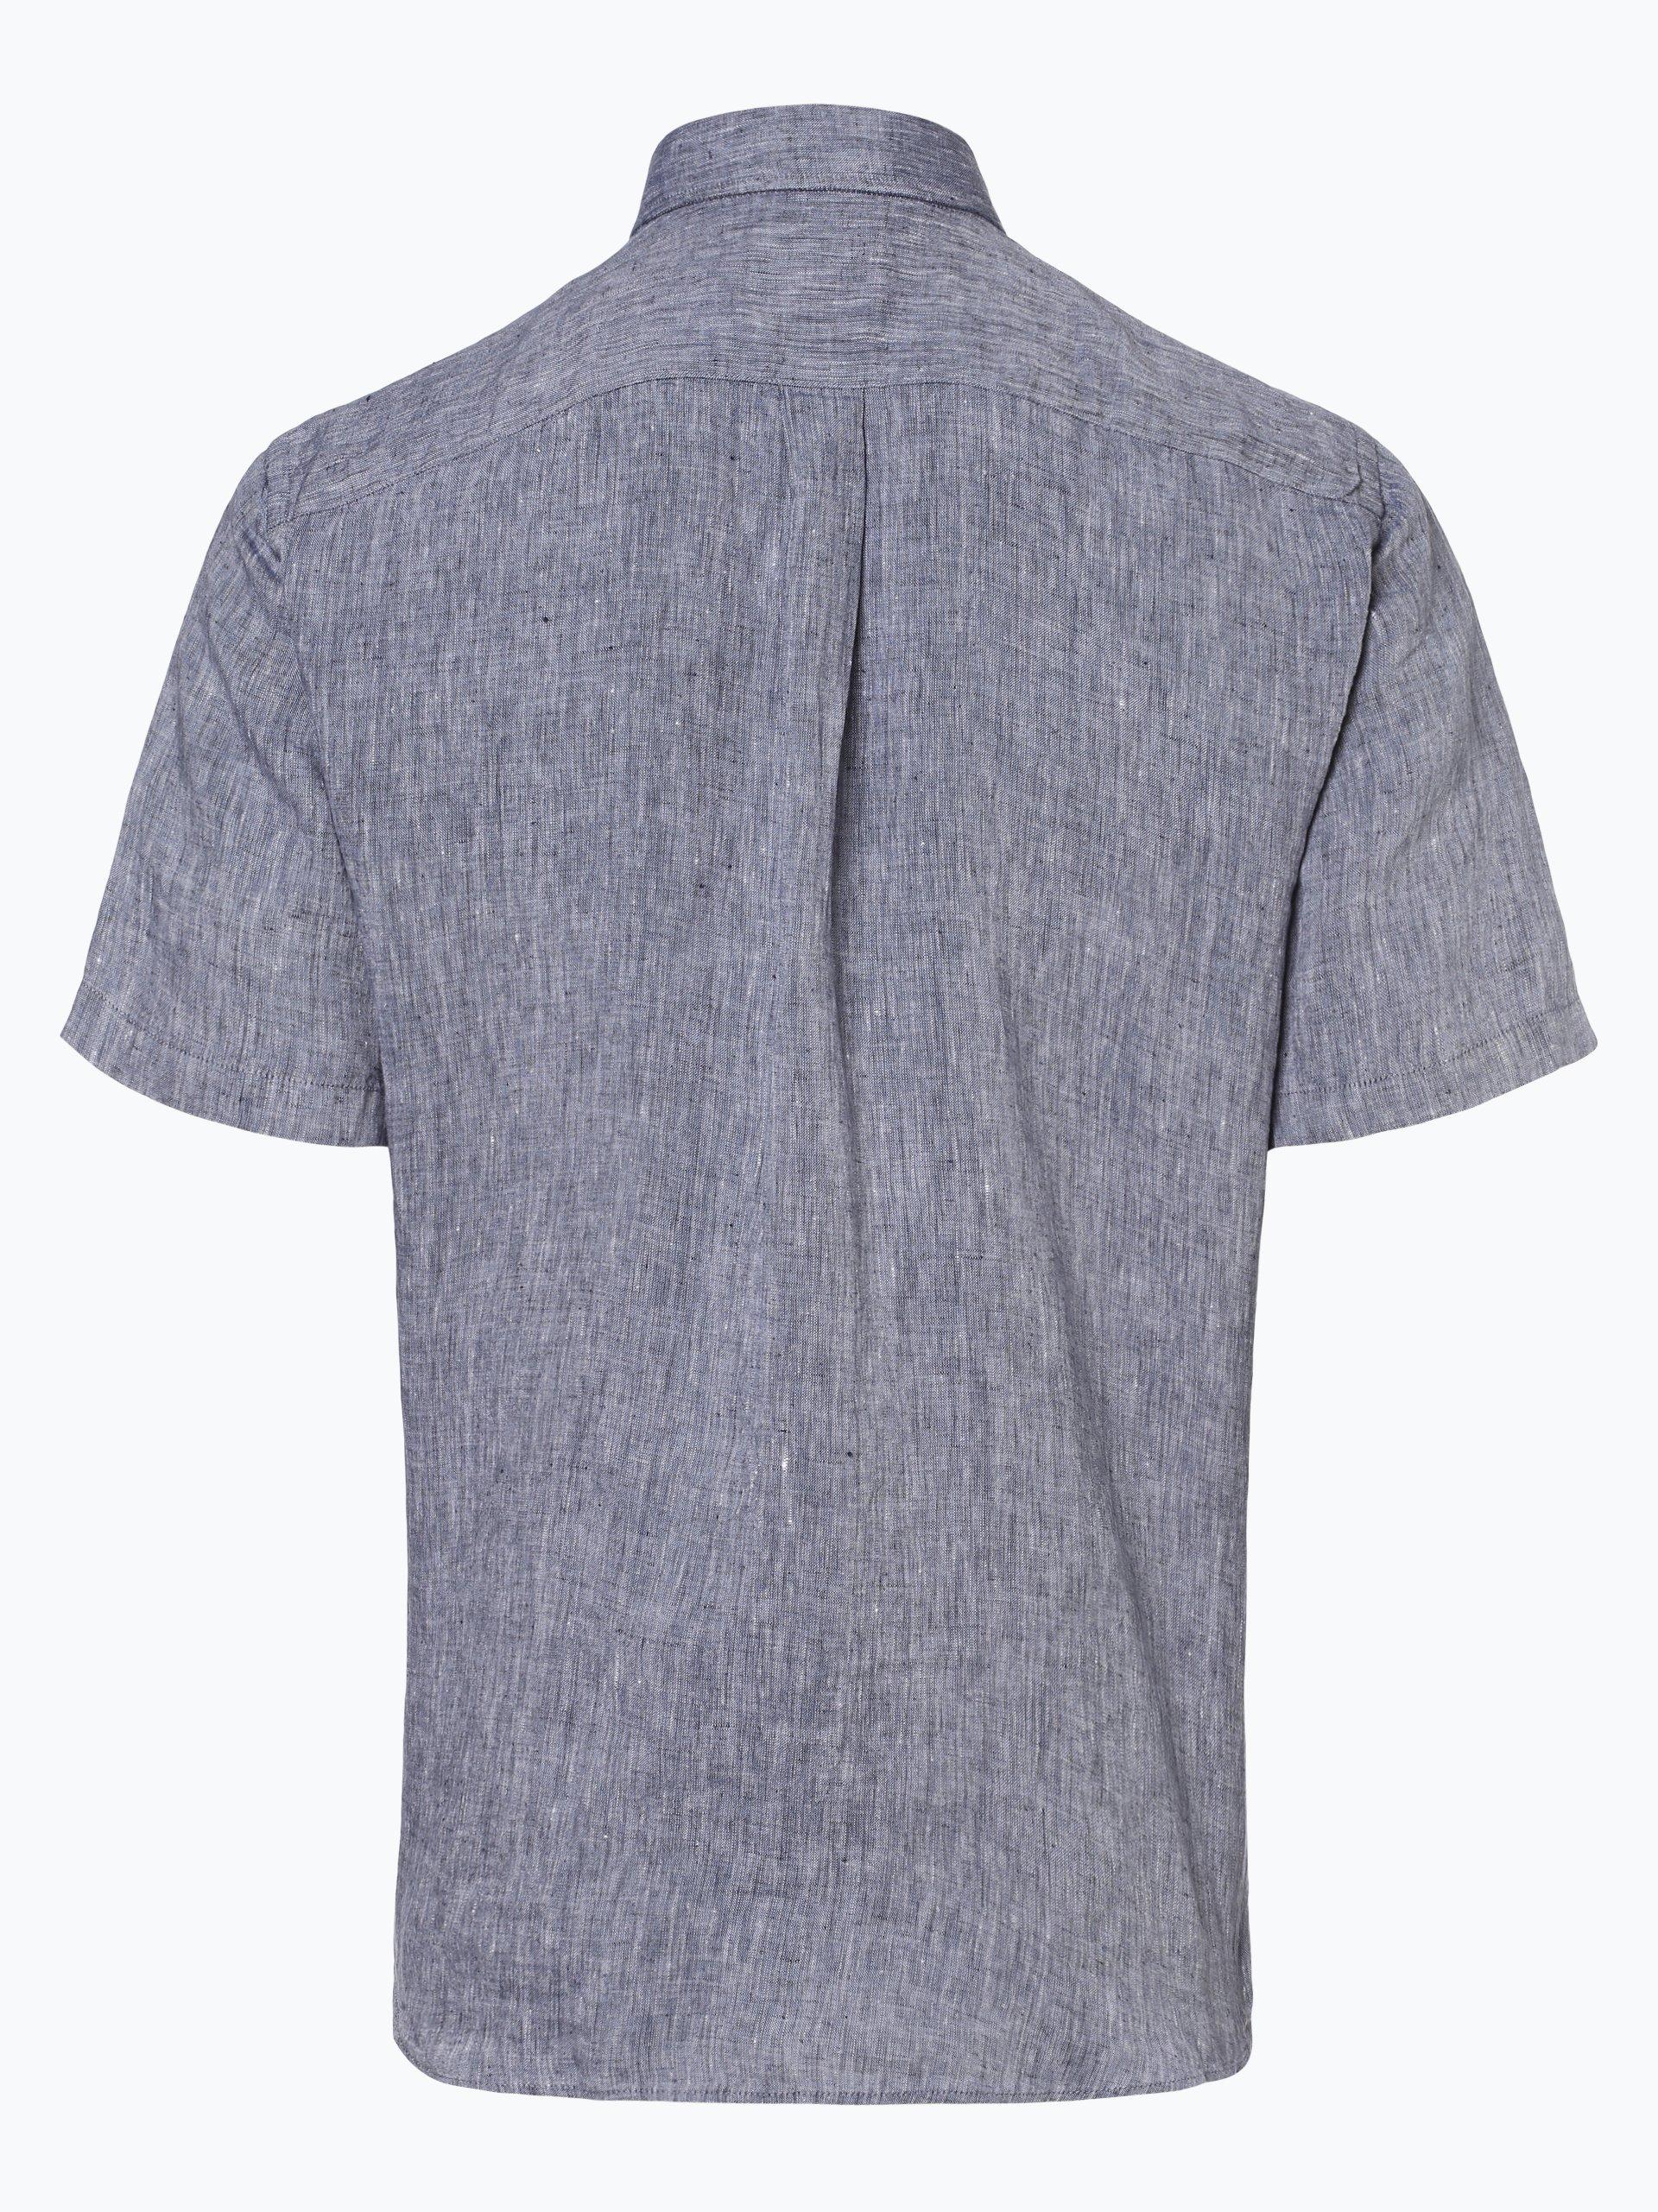 Fynch Hatton Męska koszula lniana